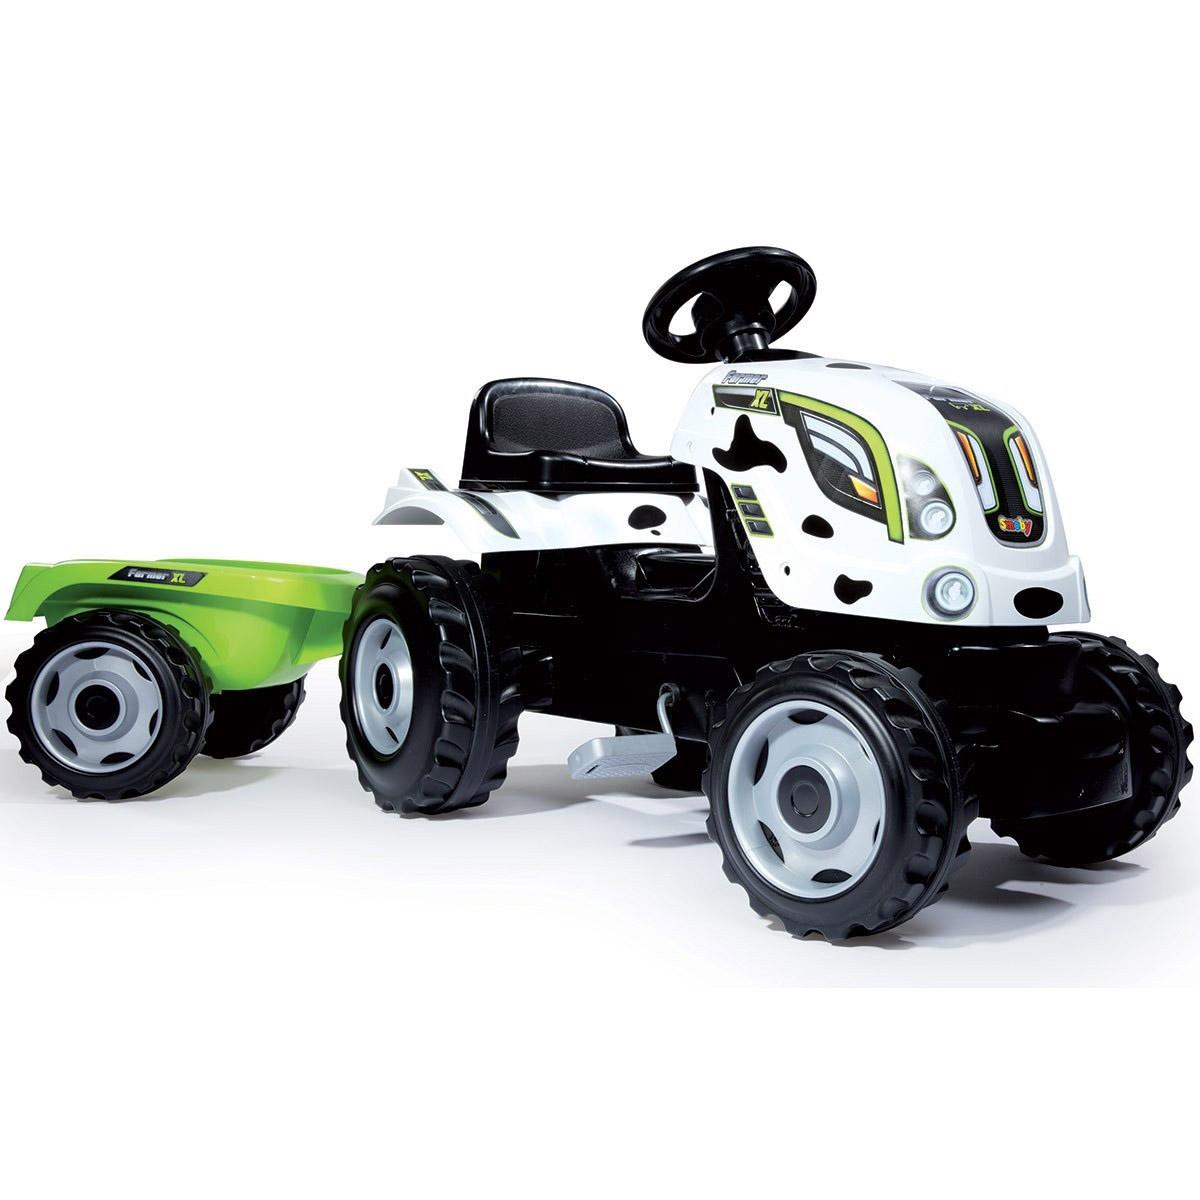 Трактор педальный Smoby XL с прицепом Пятнистый 142х44х54.5 см<br>